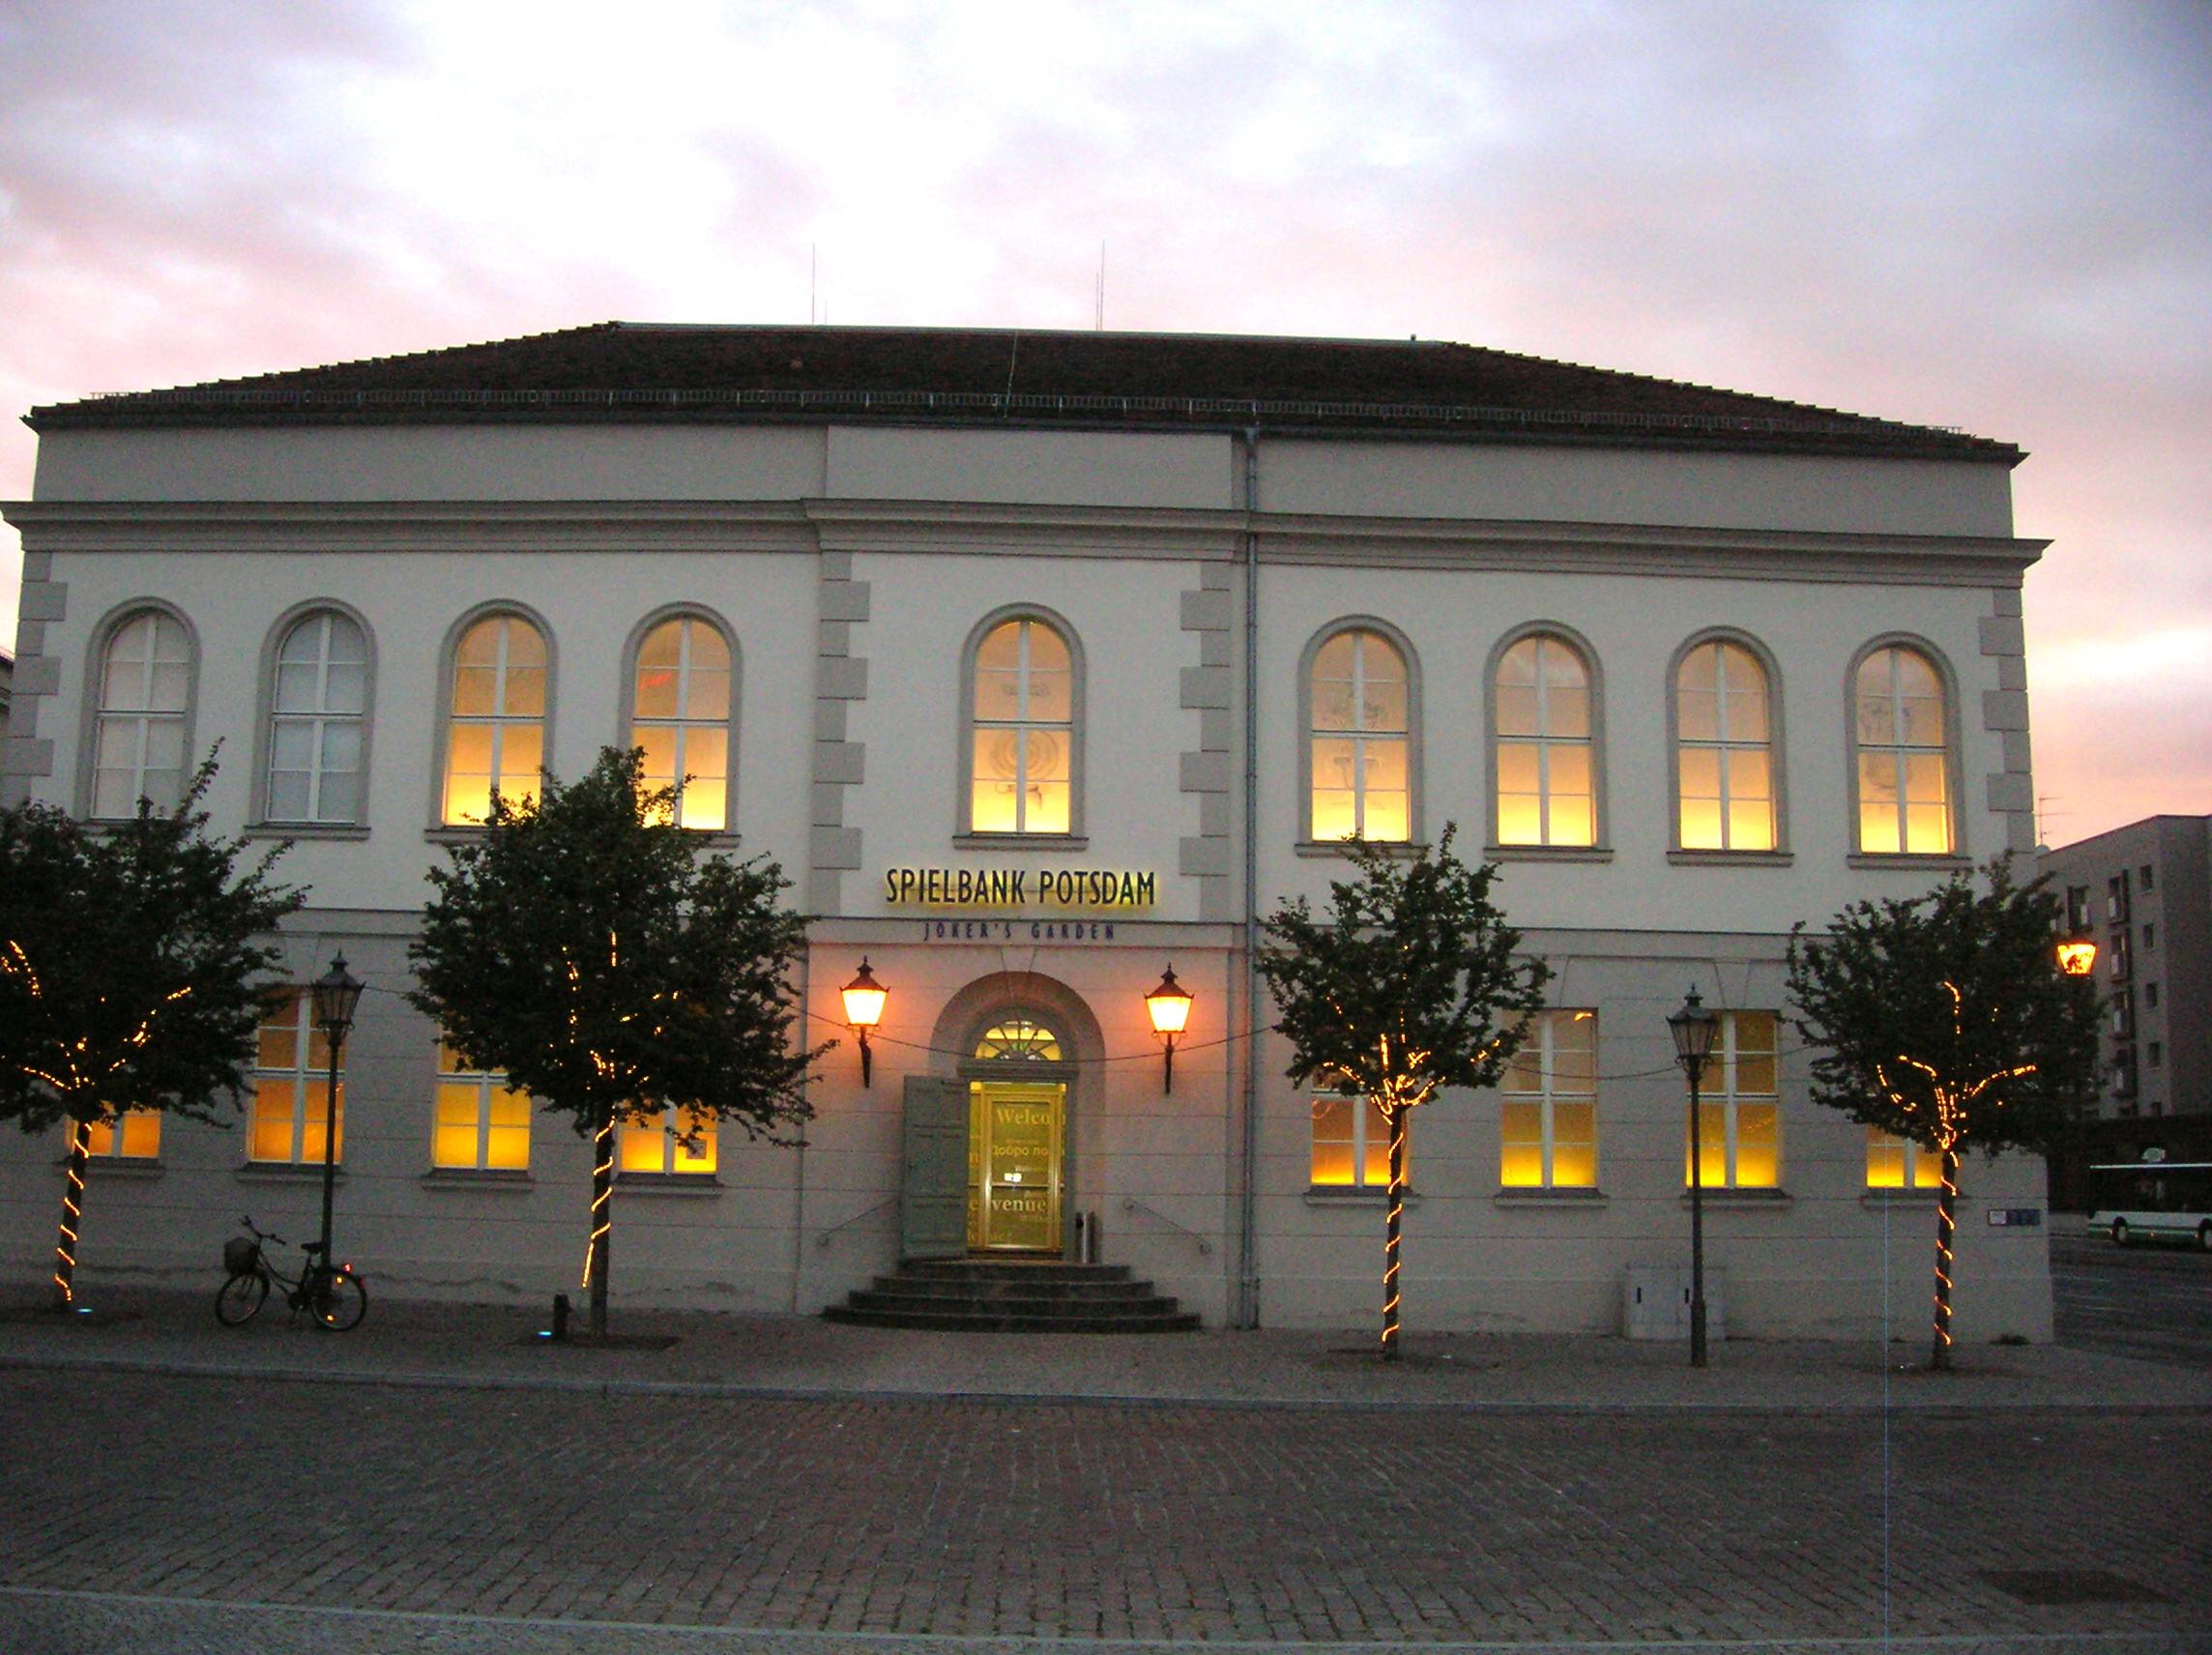 Spielbank Potsdam